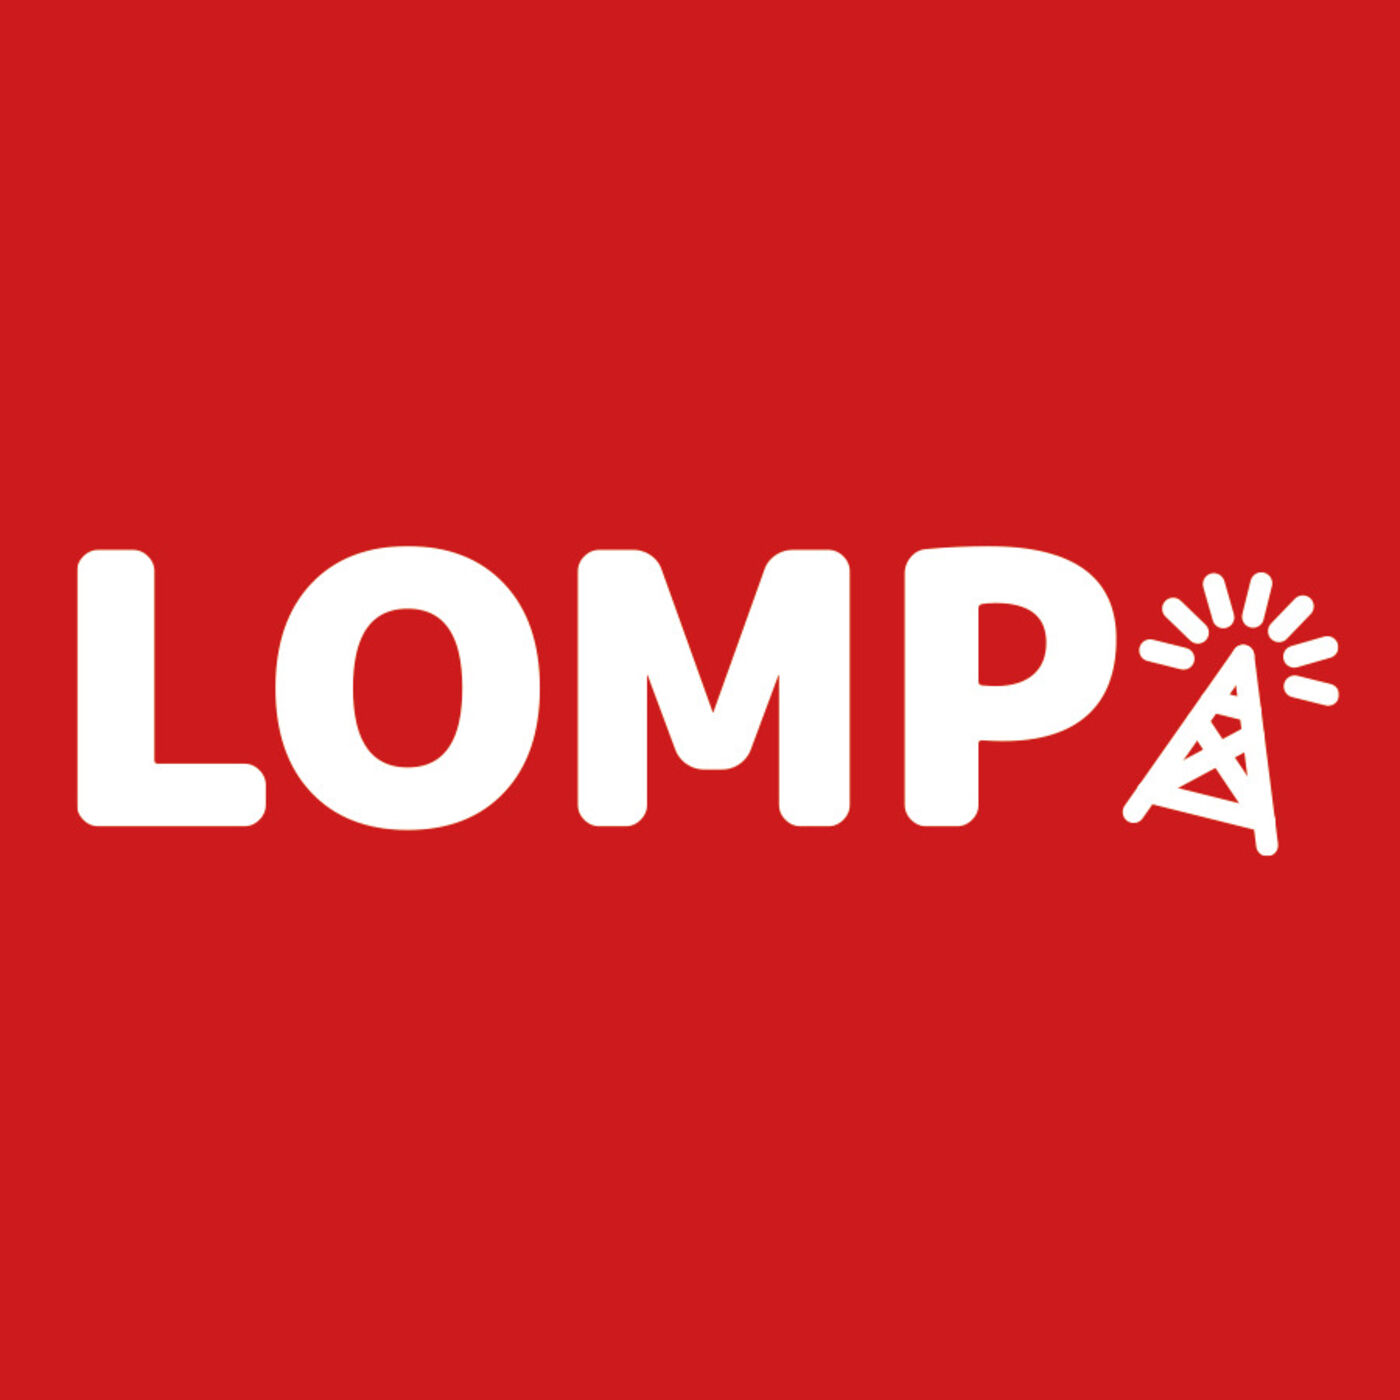 Lomp Podcast logo